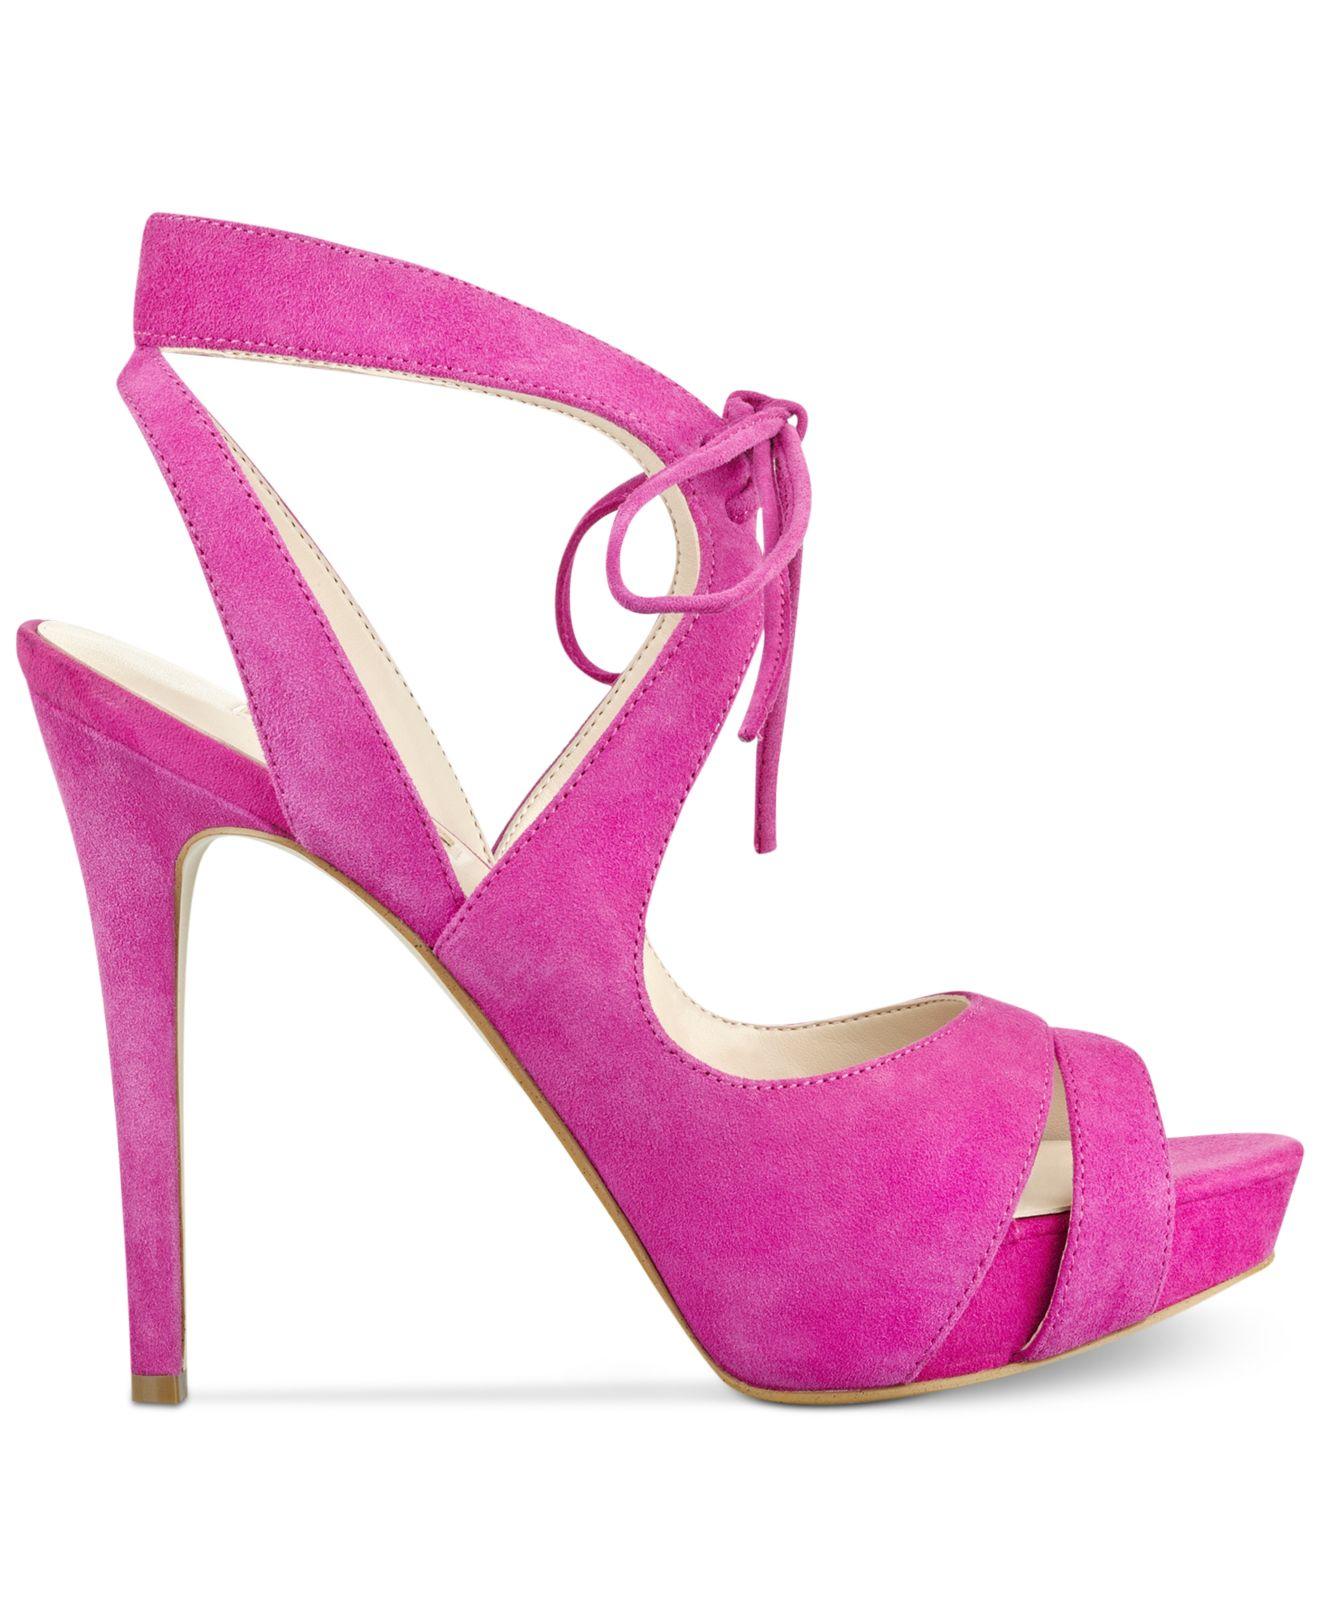 Womens Footwear Dress Sandal Ankle Strap Heels, Pink Guess